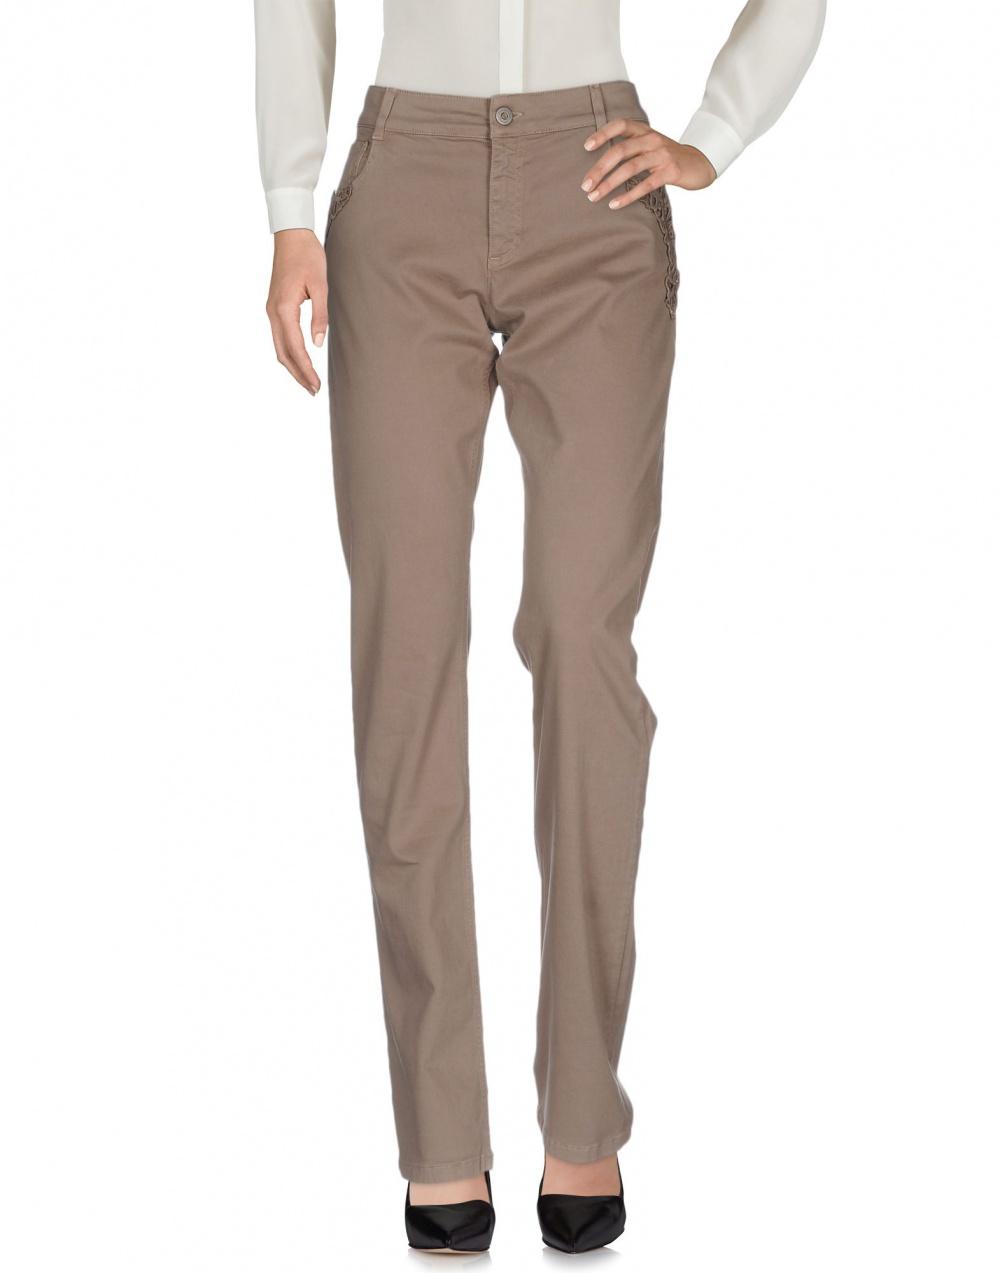 Брюки джинсы Scervino street 46-48 размер